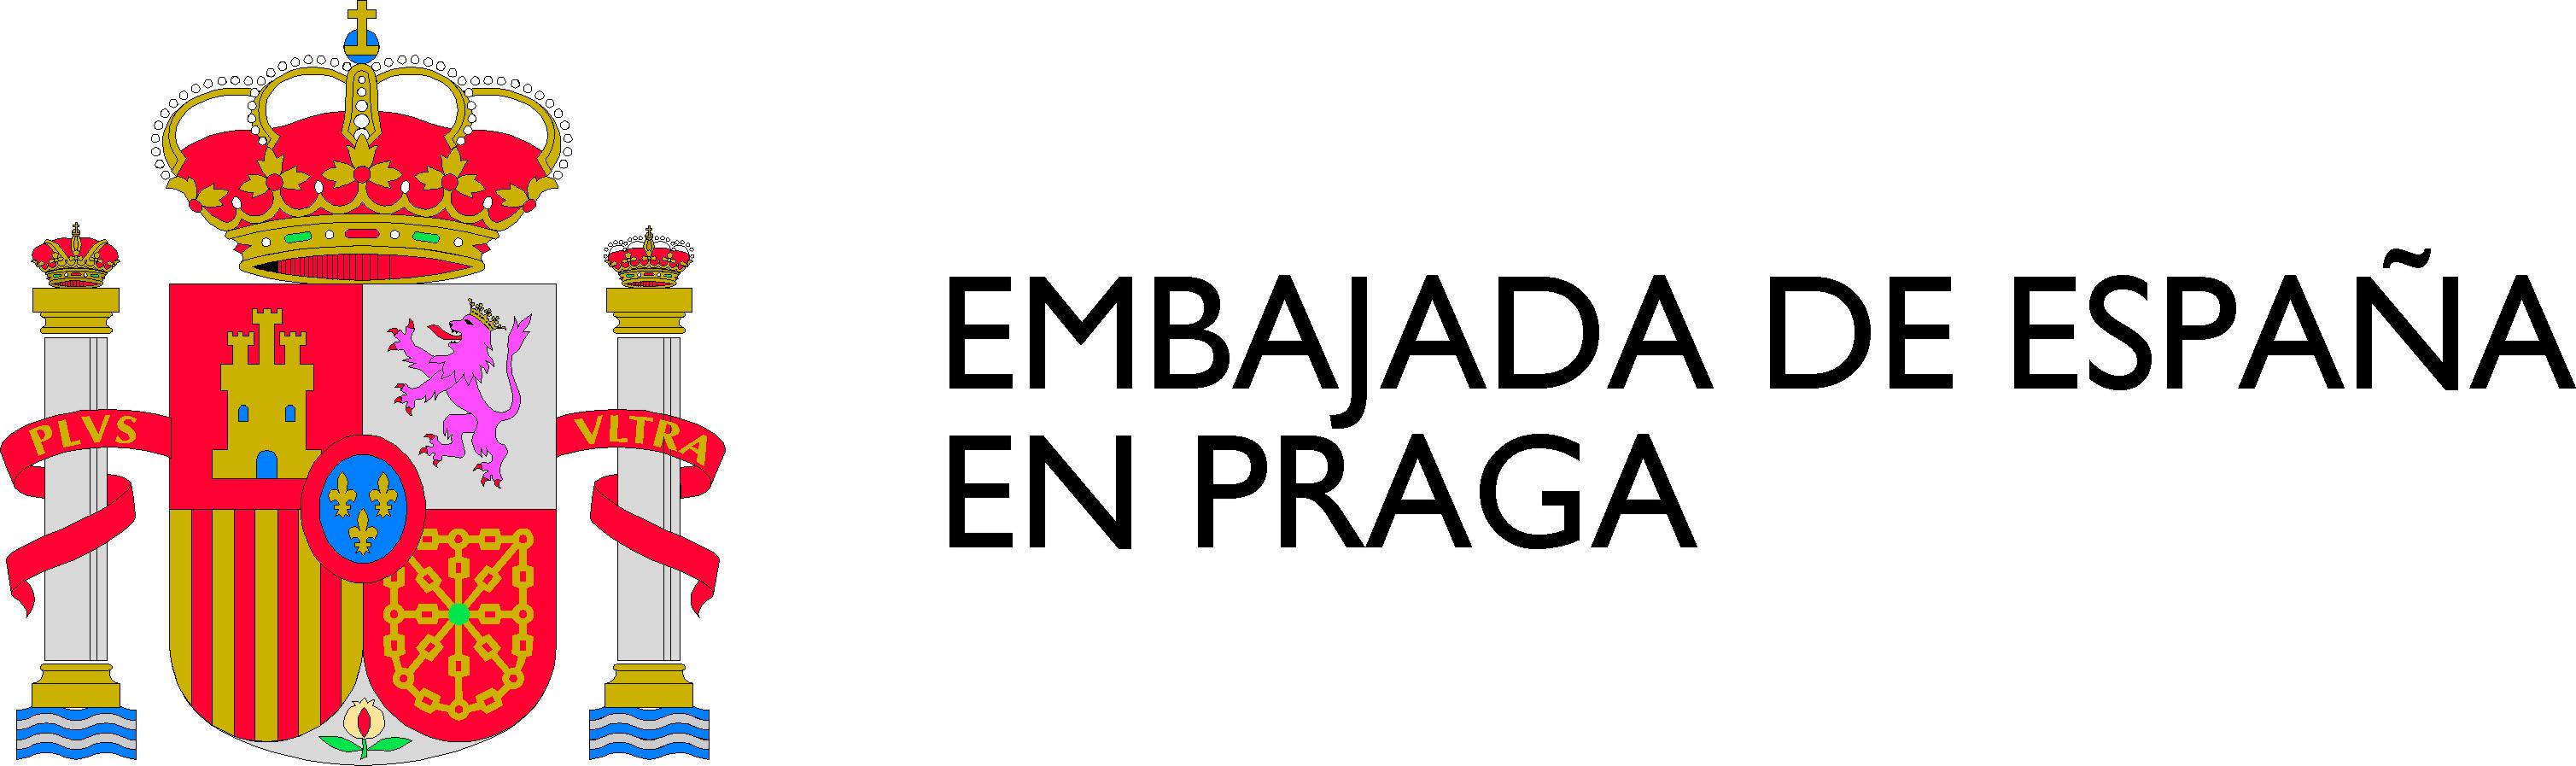 Embajada de España en Chequia